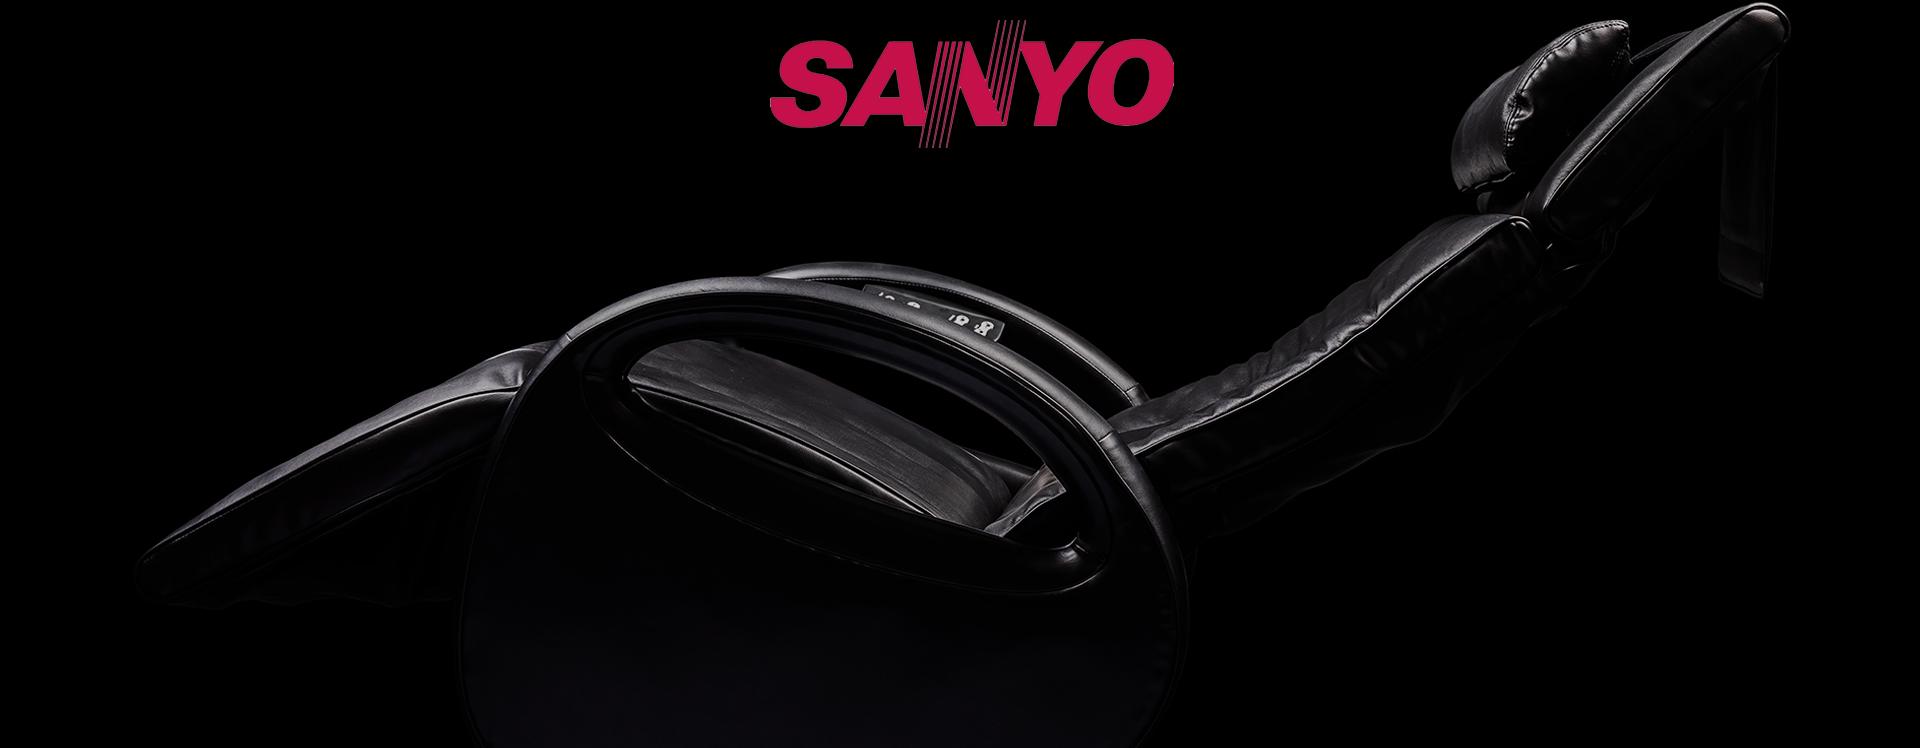 Sanyo FX2 - Zero Gravity chair - slide